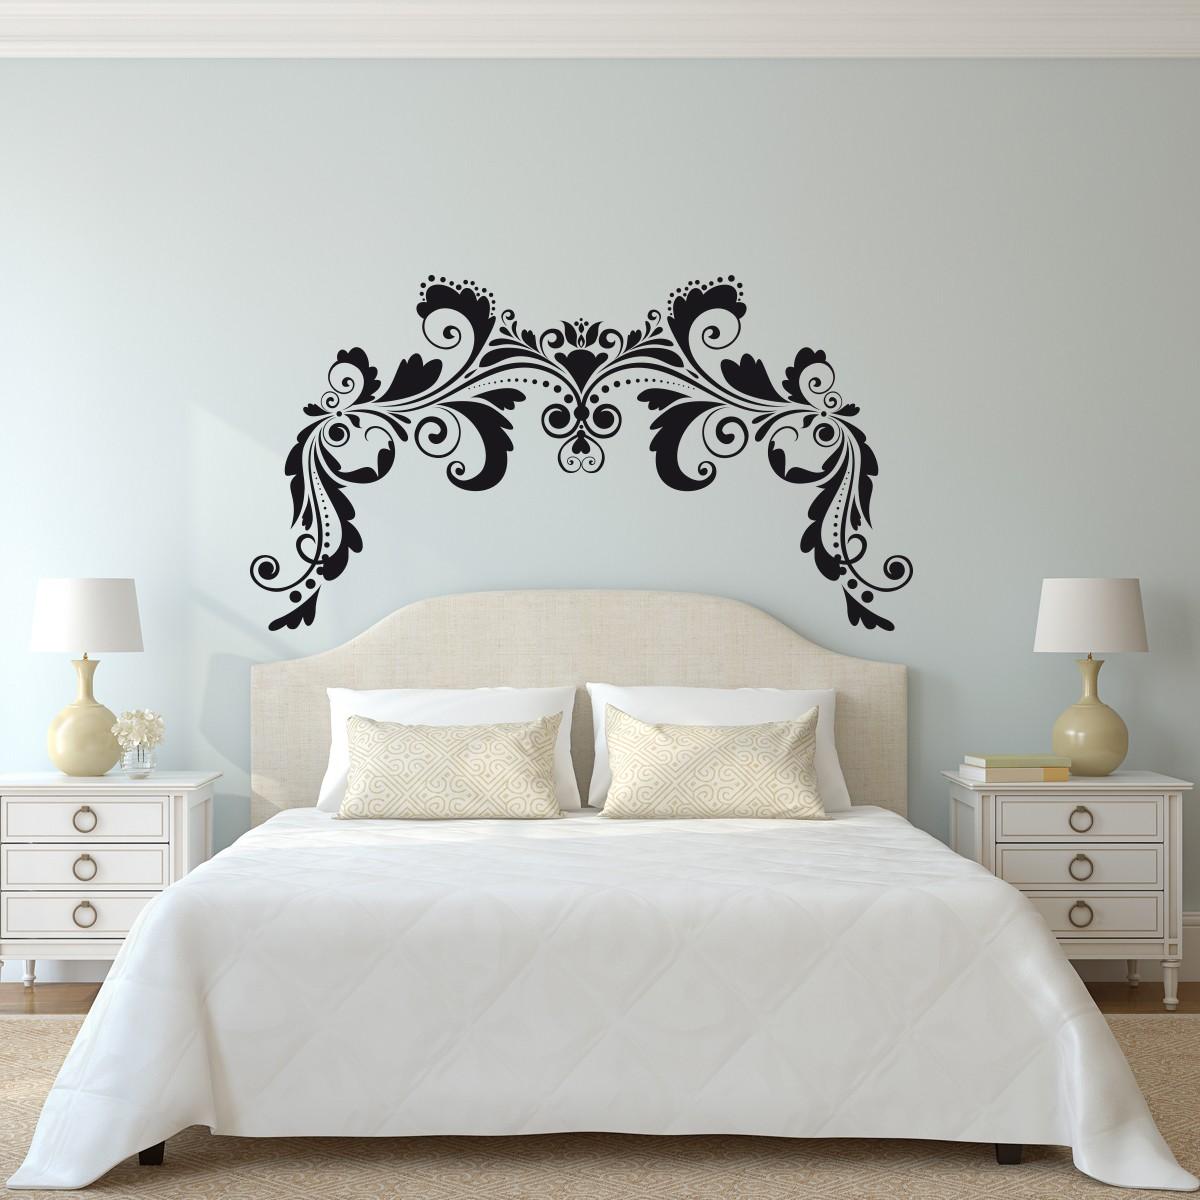 Vinilo cabecero cama ornamento sim trico - Vinilo cabecero cama ...